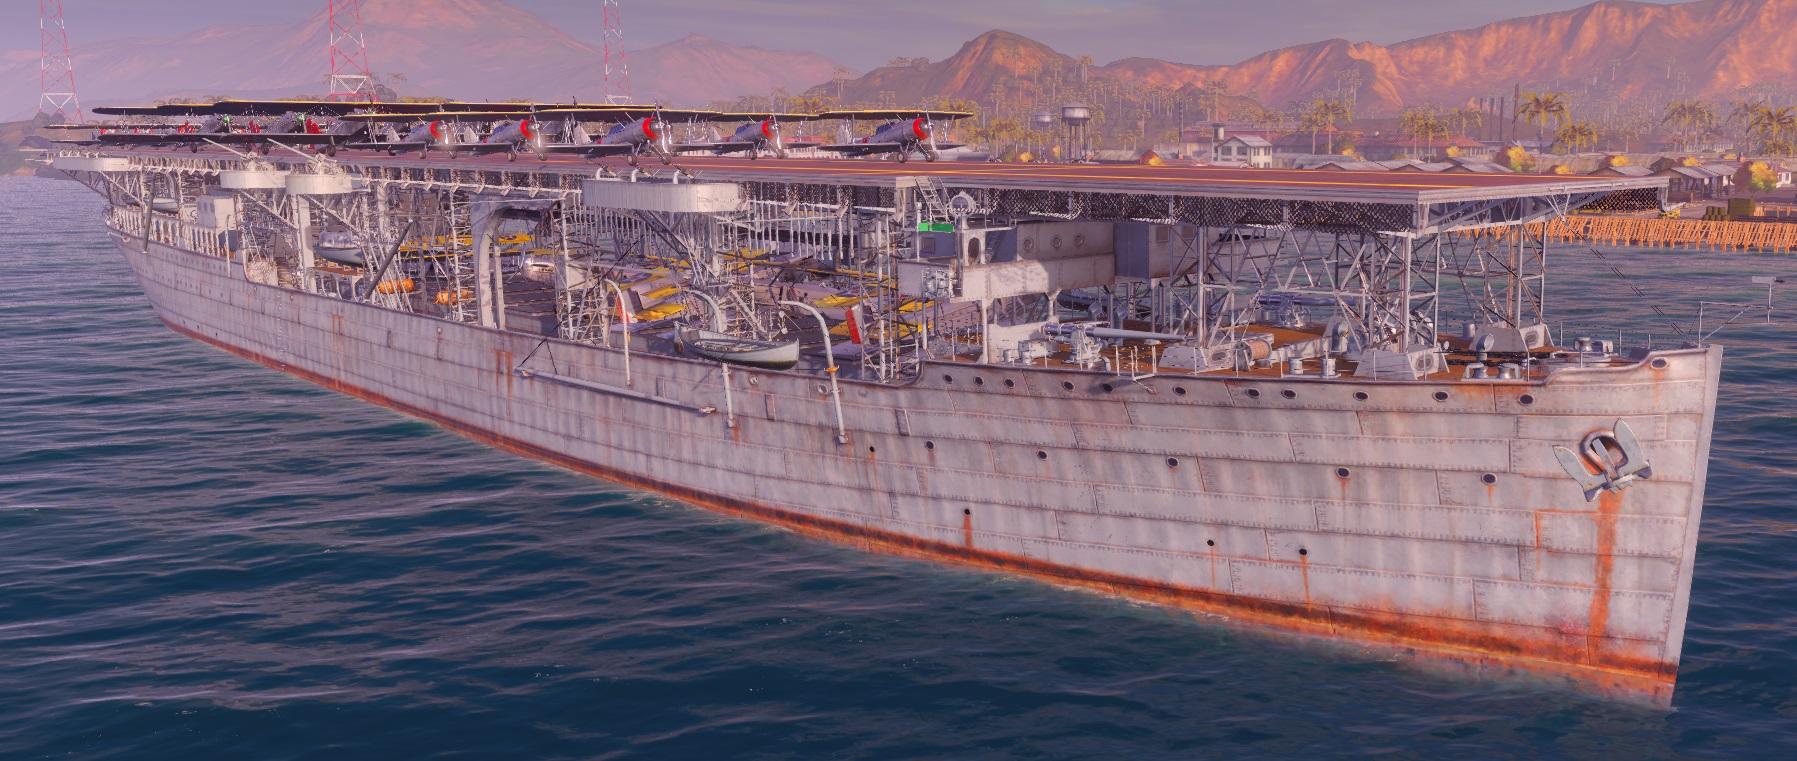 Langley - World of Warships Wiki*